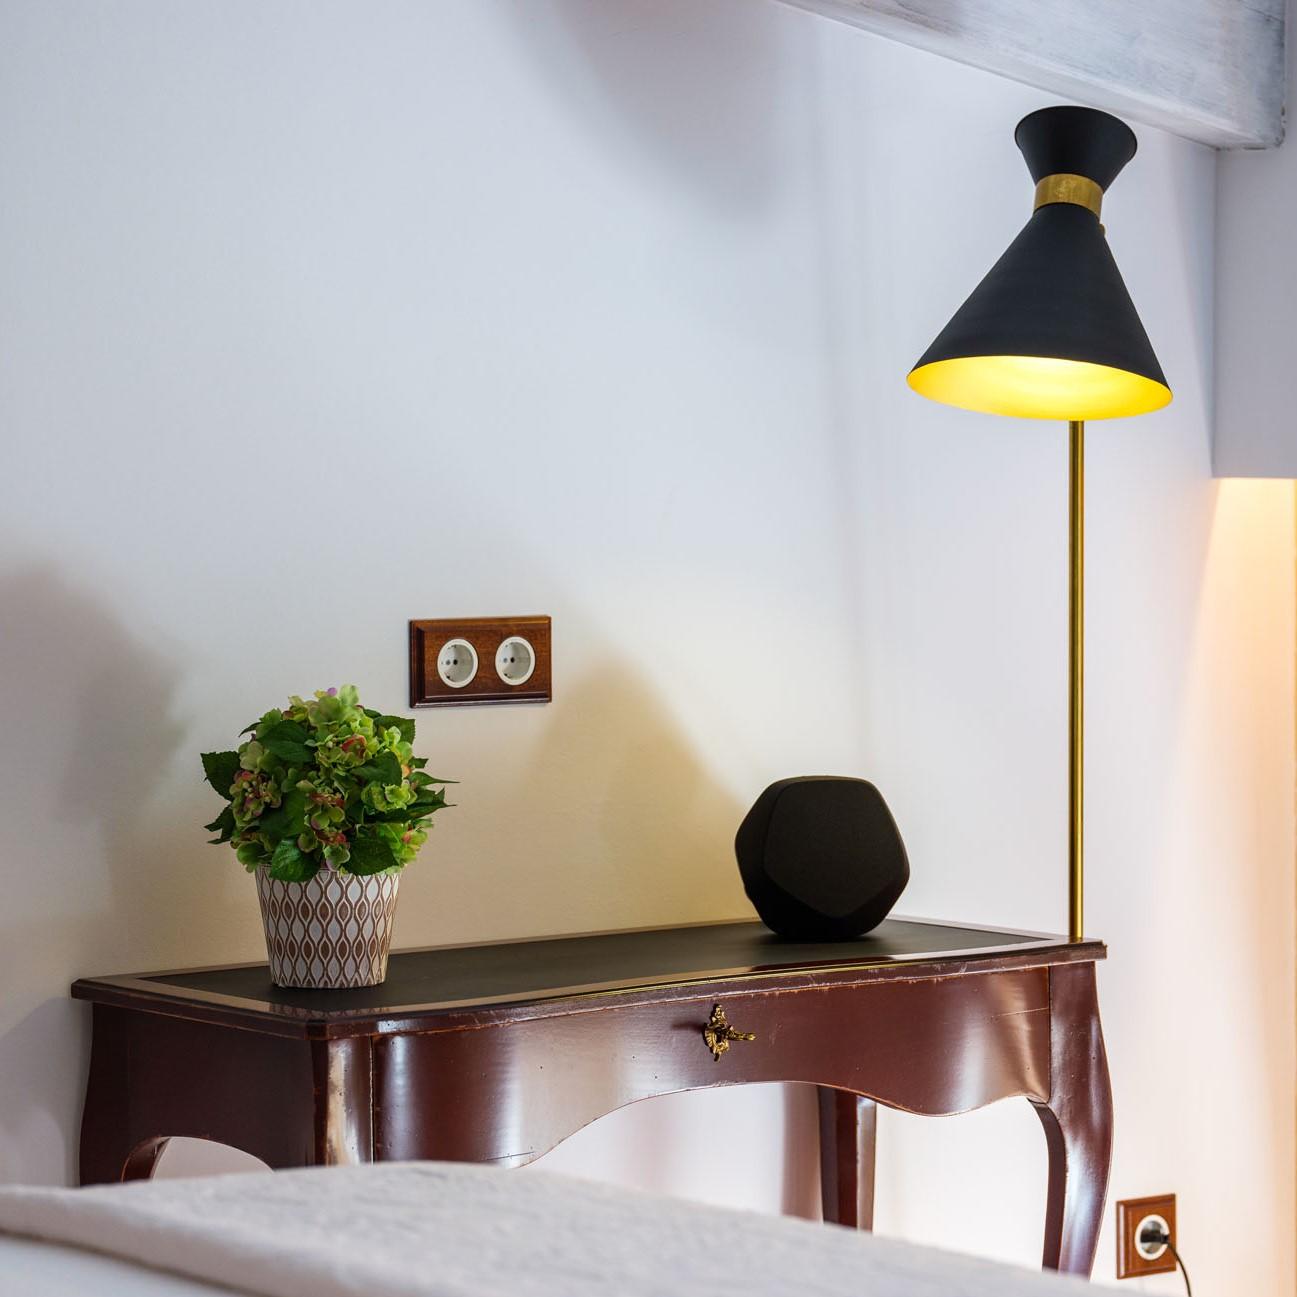 lampara vintage de pie hotel mallorca gloria de sant jaume